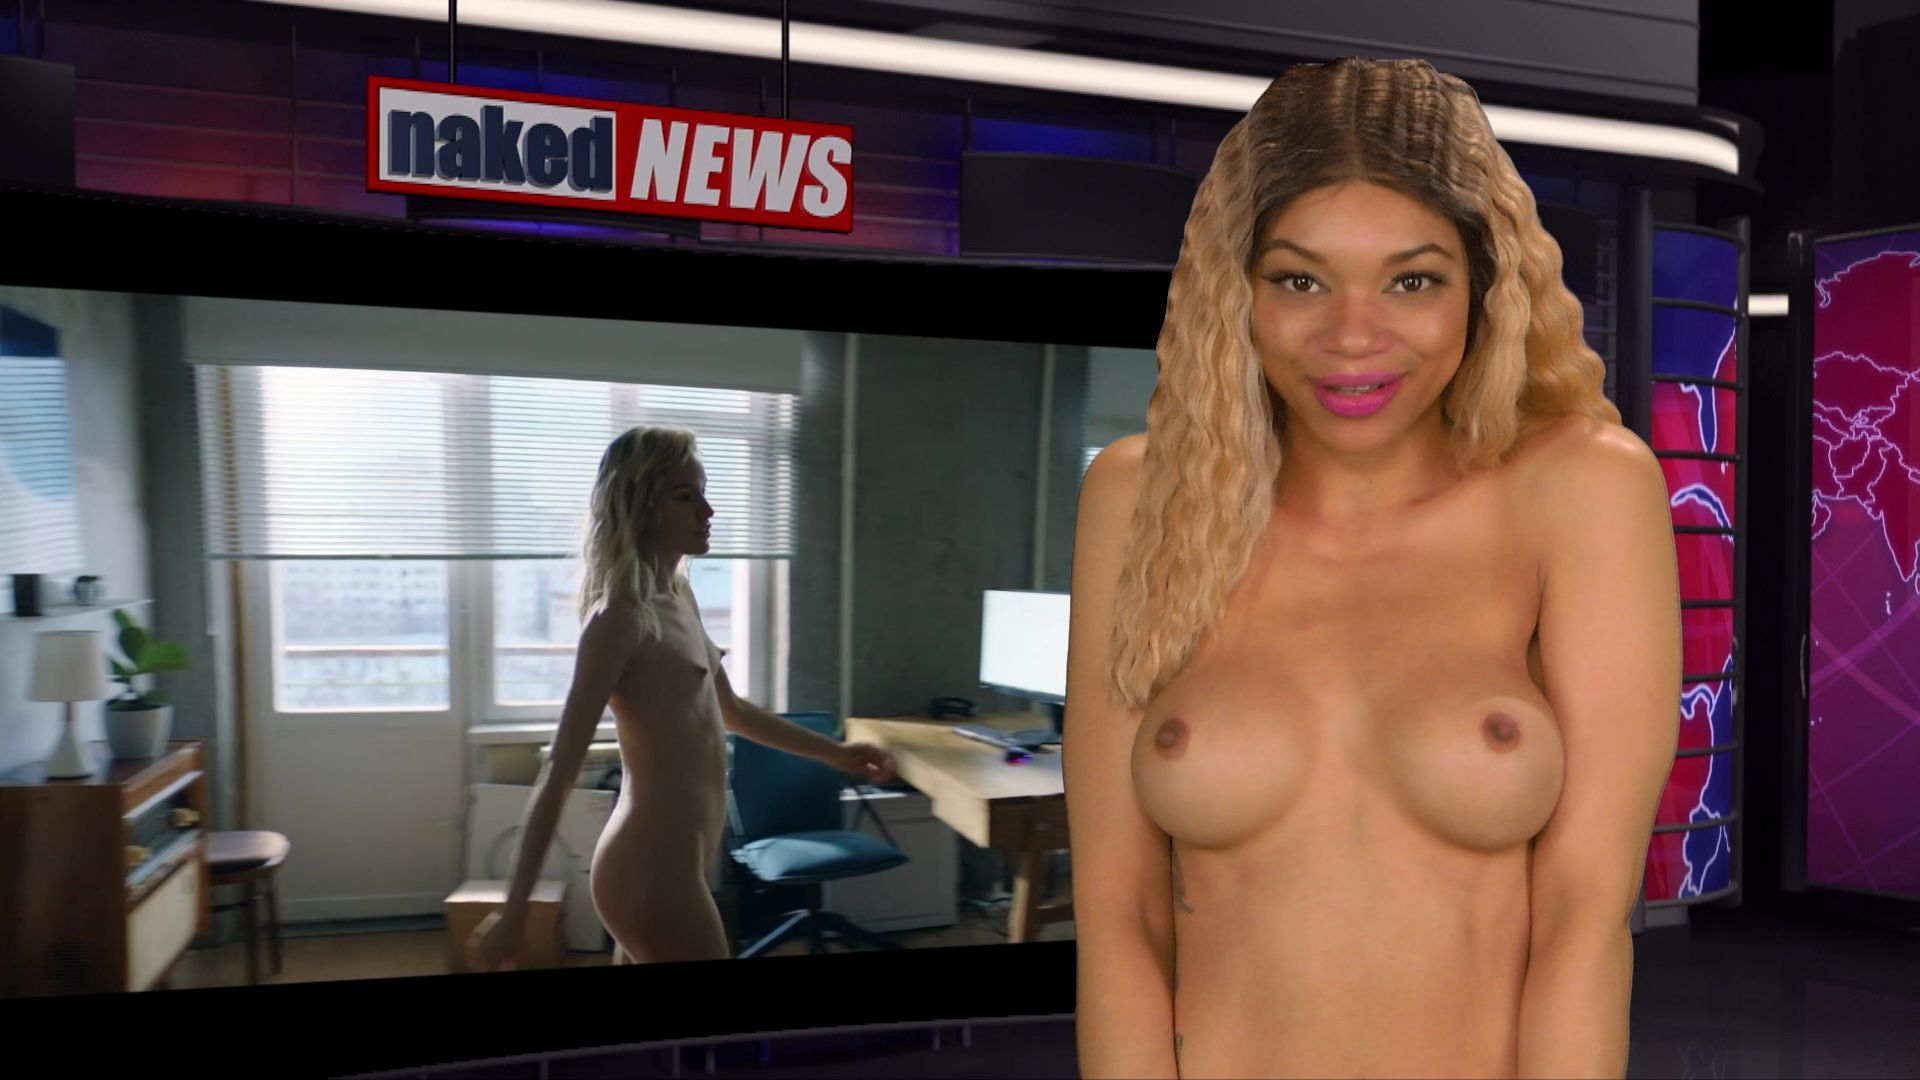 Naked News Beautiful Nudes, Hot Naked Females, Nude Weather Girls 0004